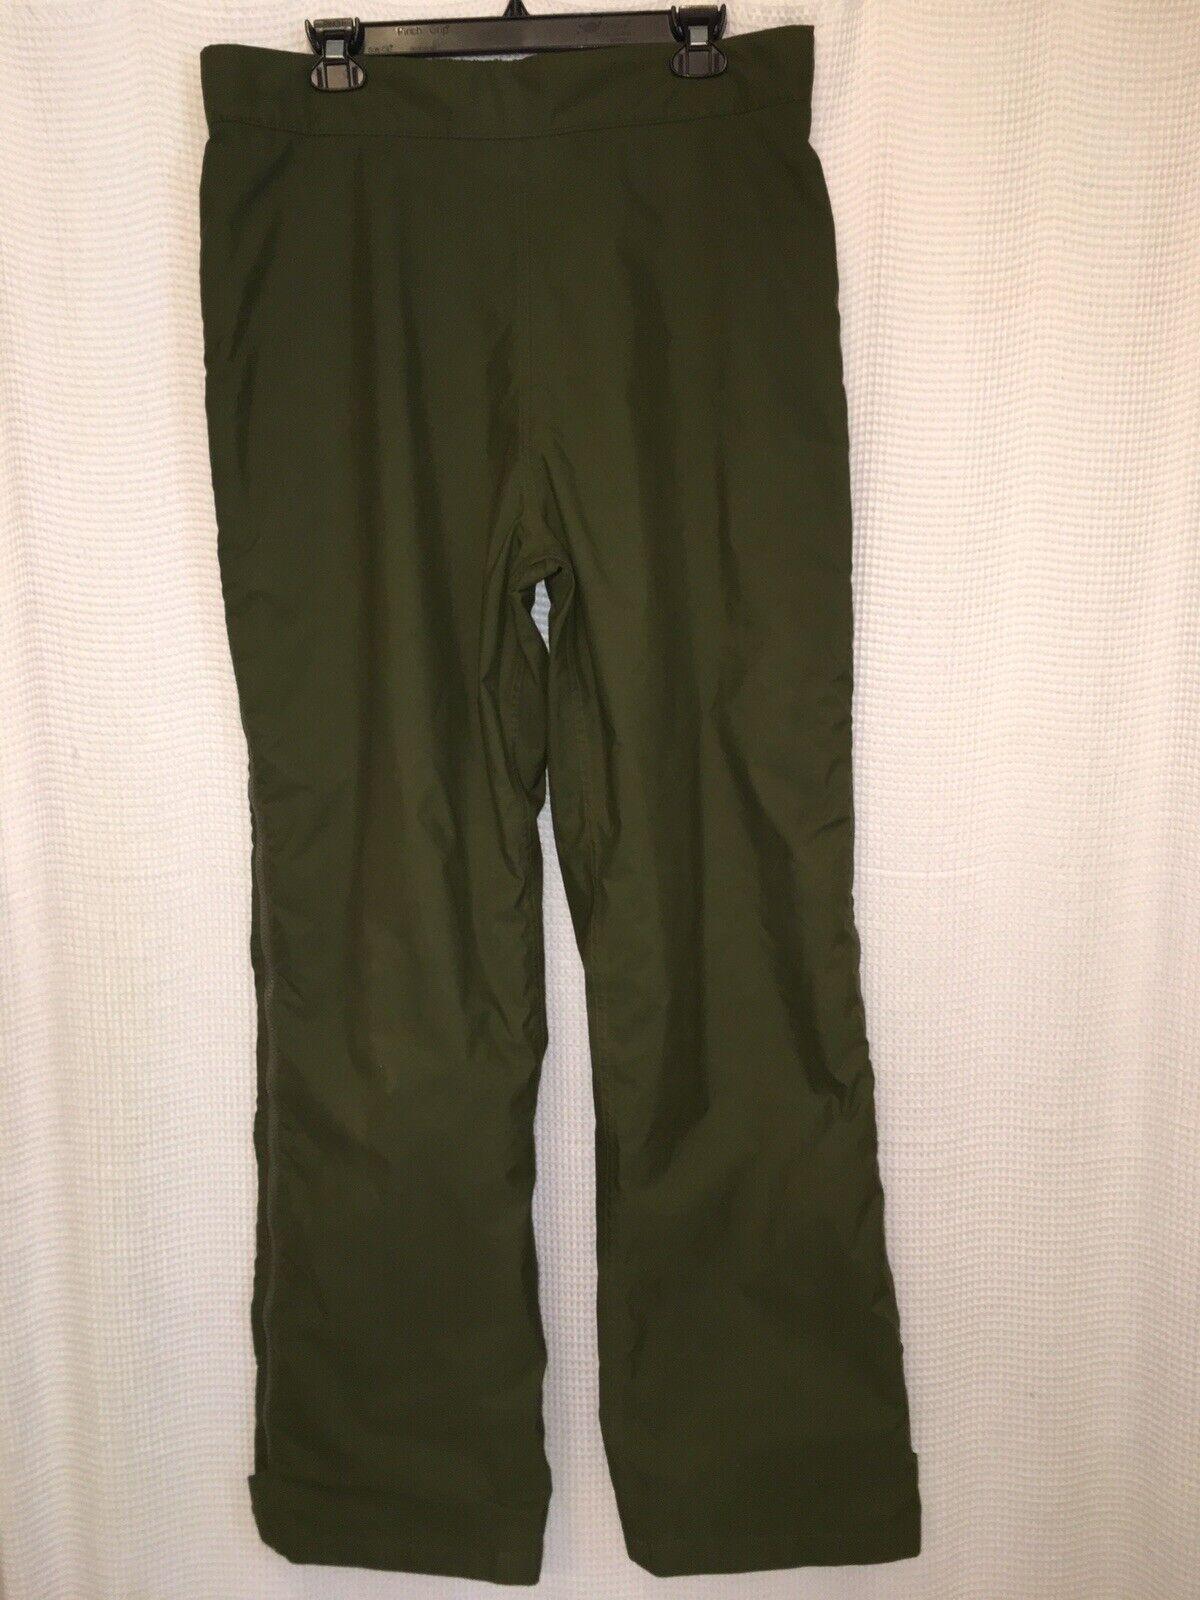 The North Face  GoreTex Pants Mens Large Ski Work Dark Olive Green Zip Legs USA  affordable